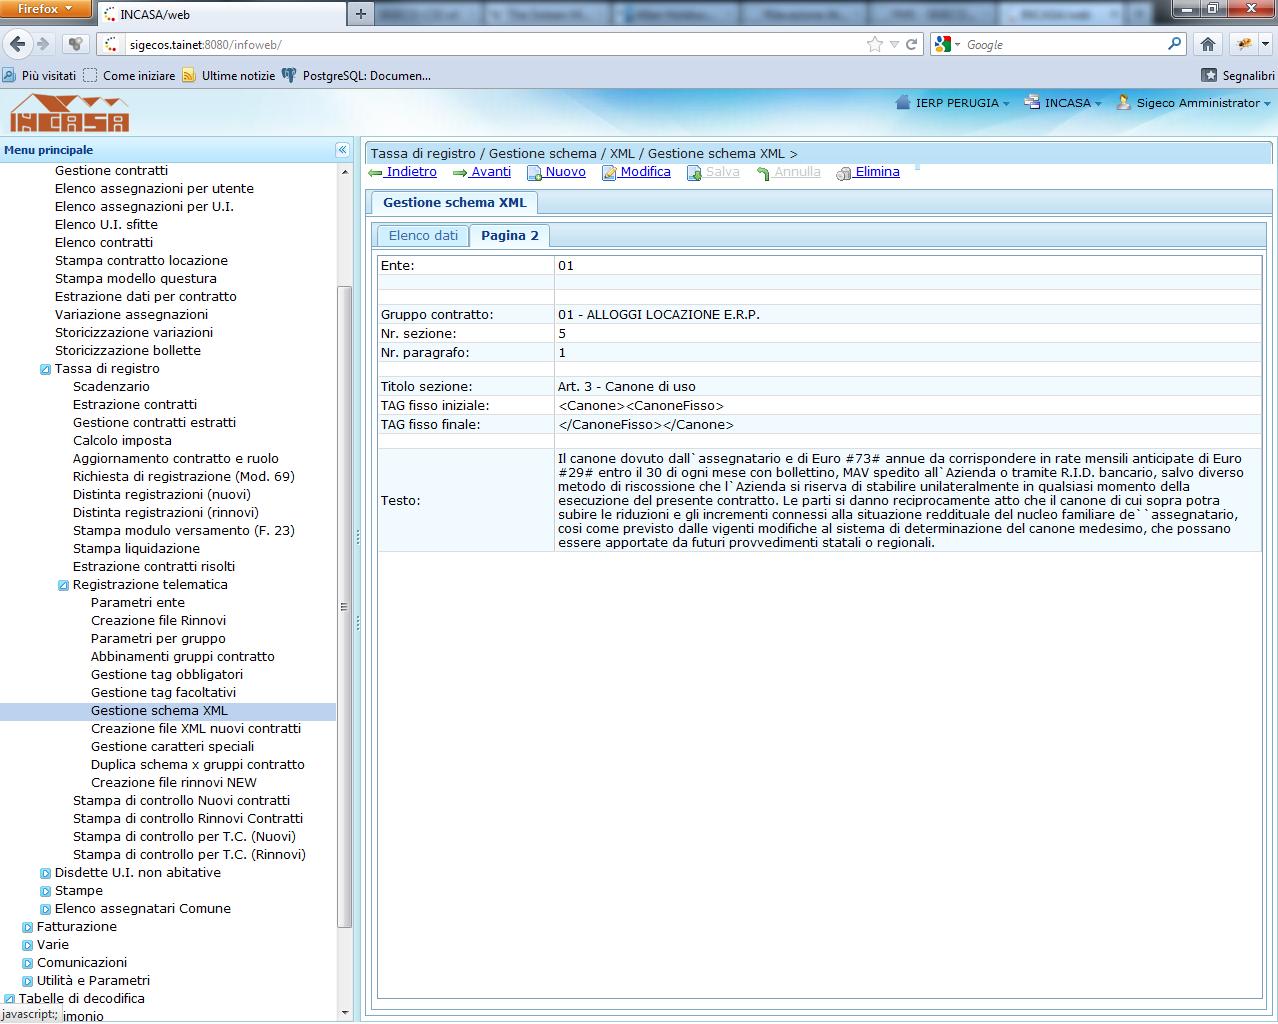 Gestione schema XML per procedura Entratel